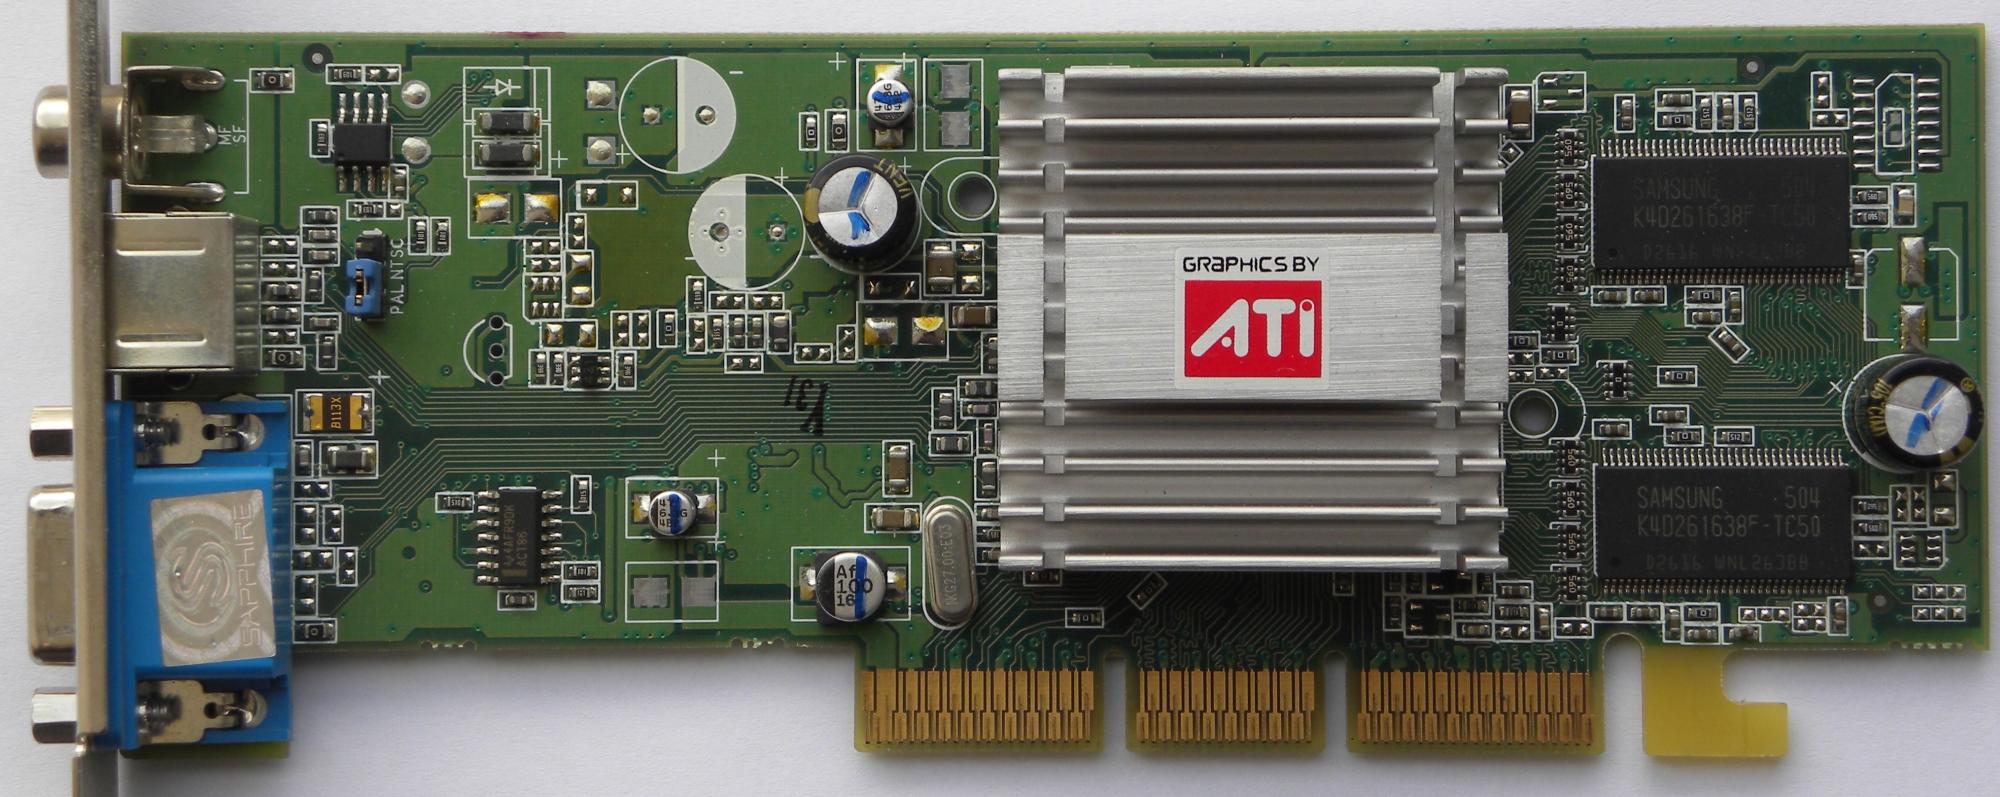 Ati 9250 agp8x 128mb драйвер windows 7 youtube.